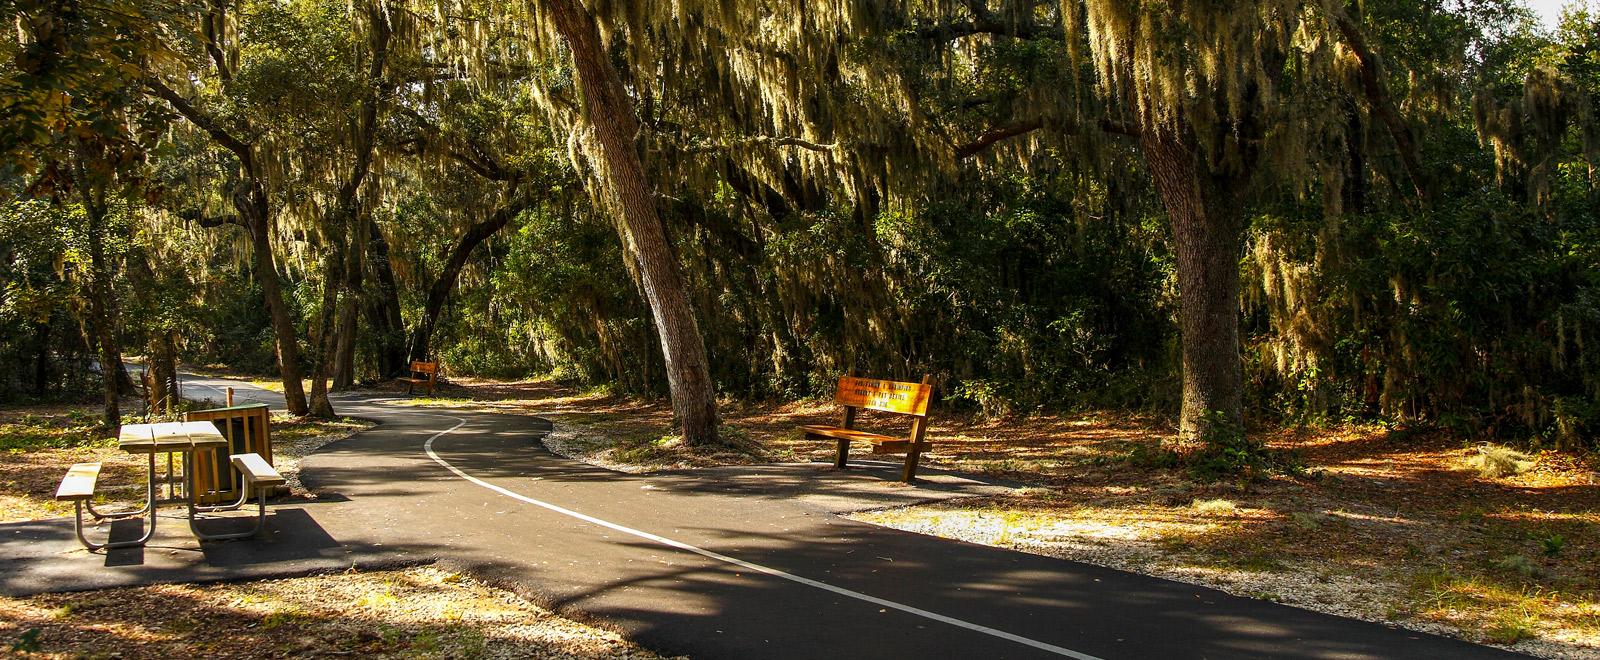 agc_subhead-img_nature_trail.jpg